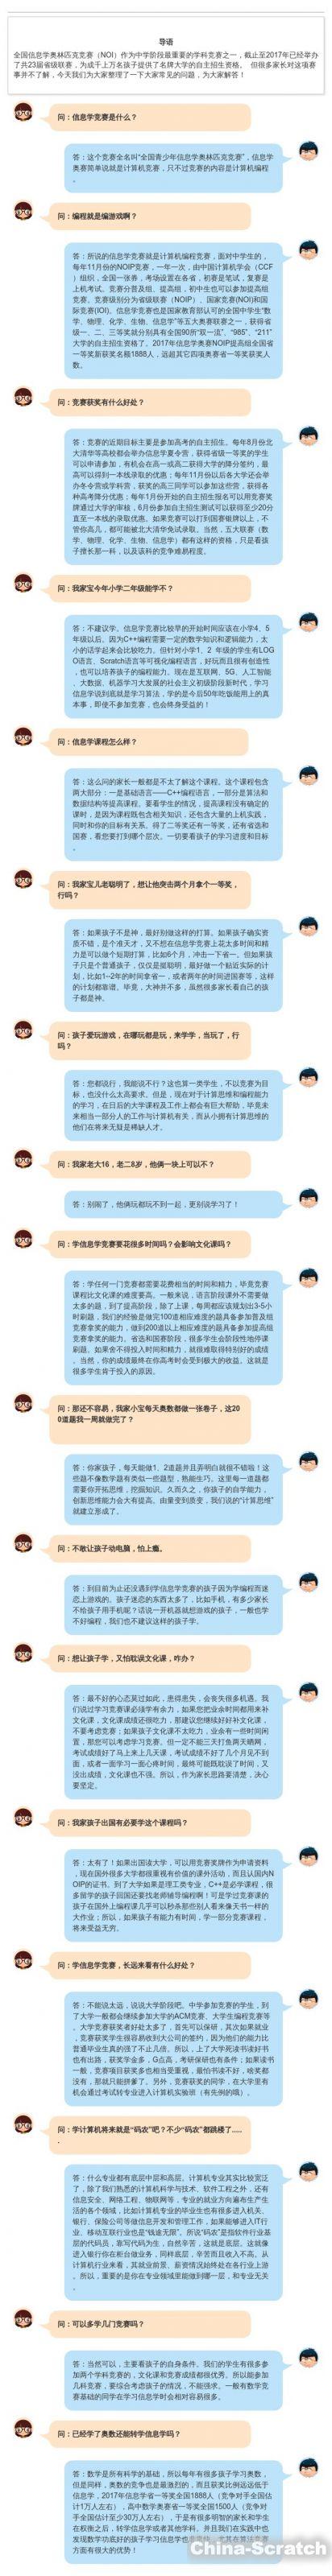 https://cdn.china-scratch.com/timg/190424/19393G049-1.jpg